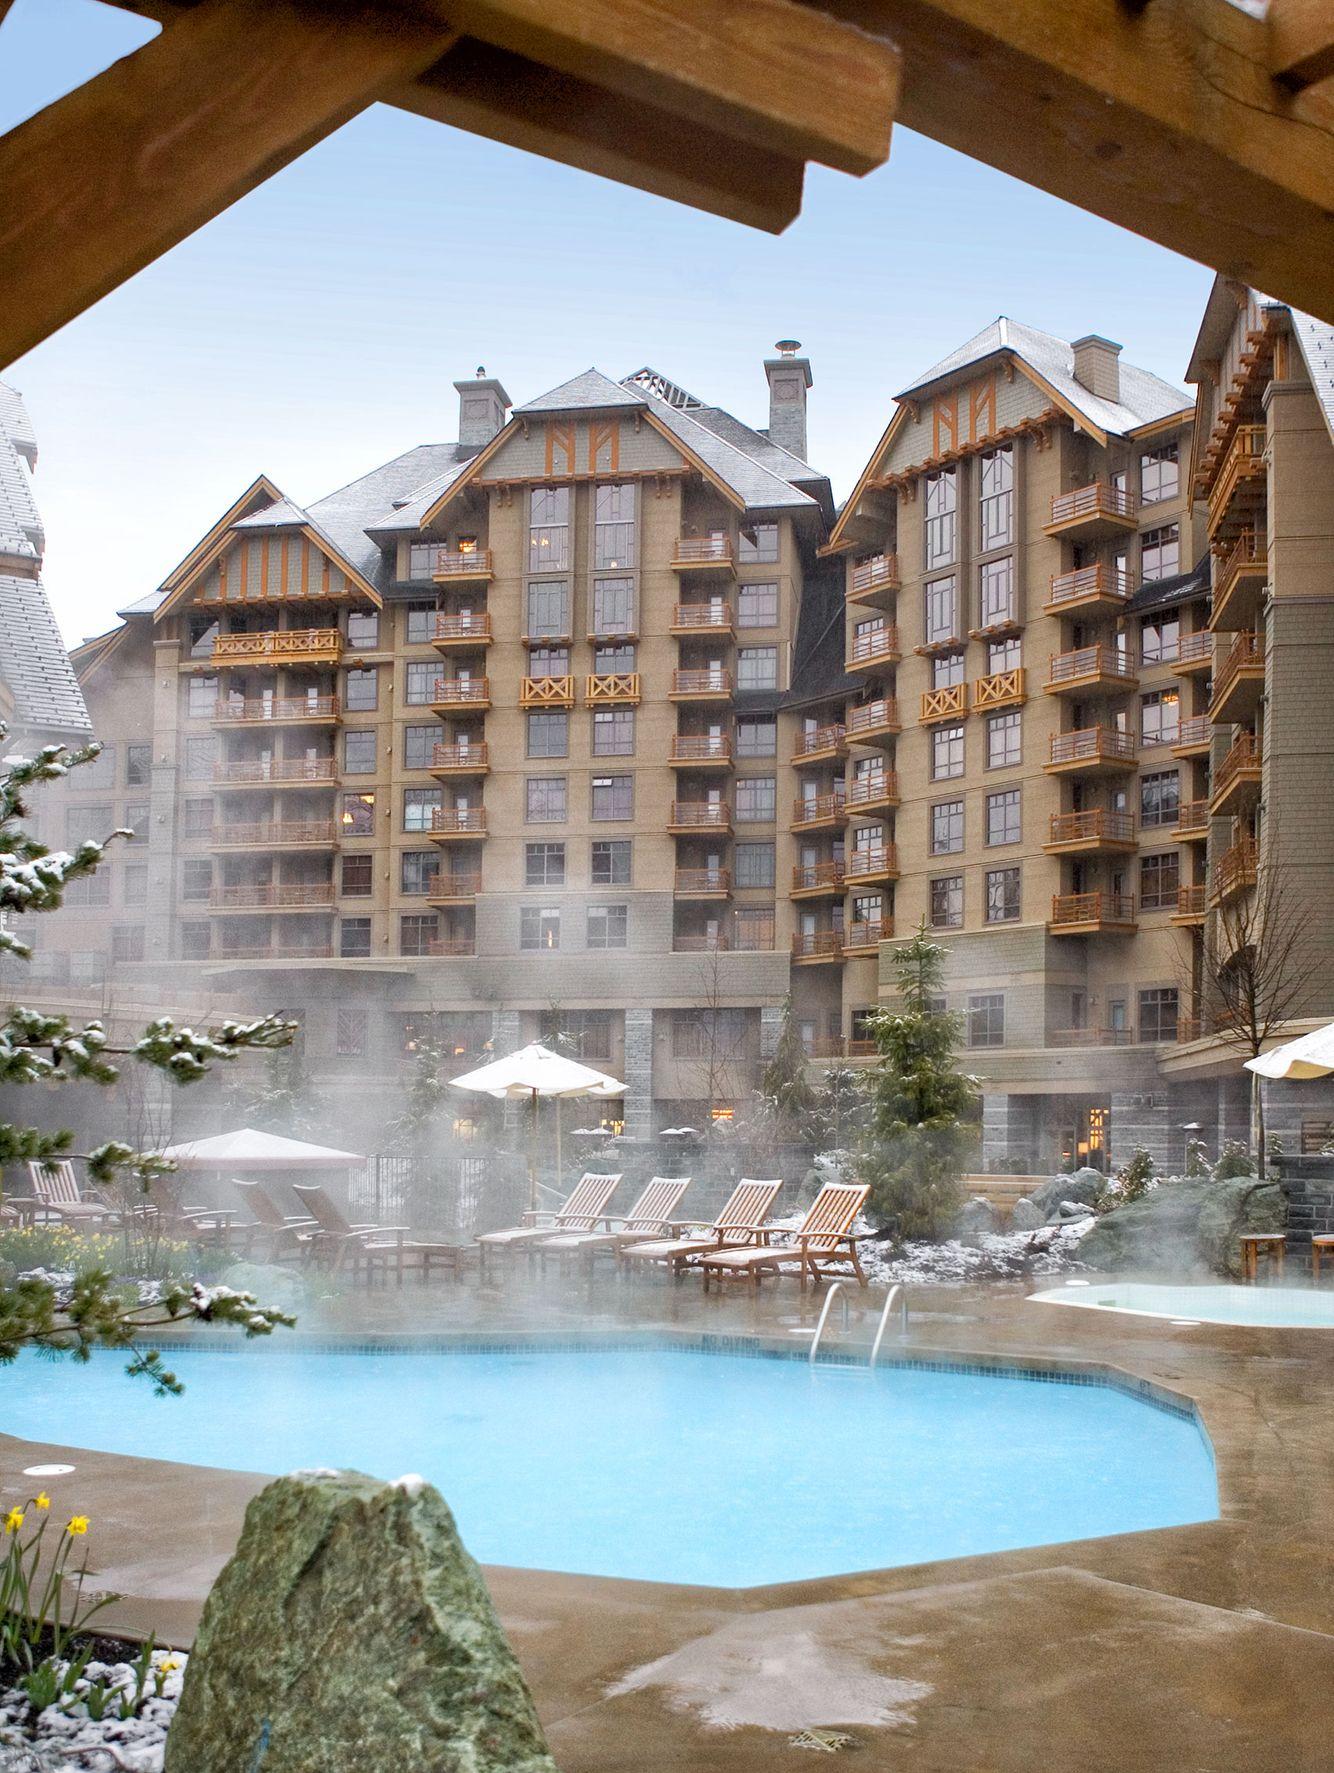 John-Sutton-Photography-Four Seasons Resort Pool